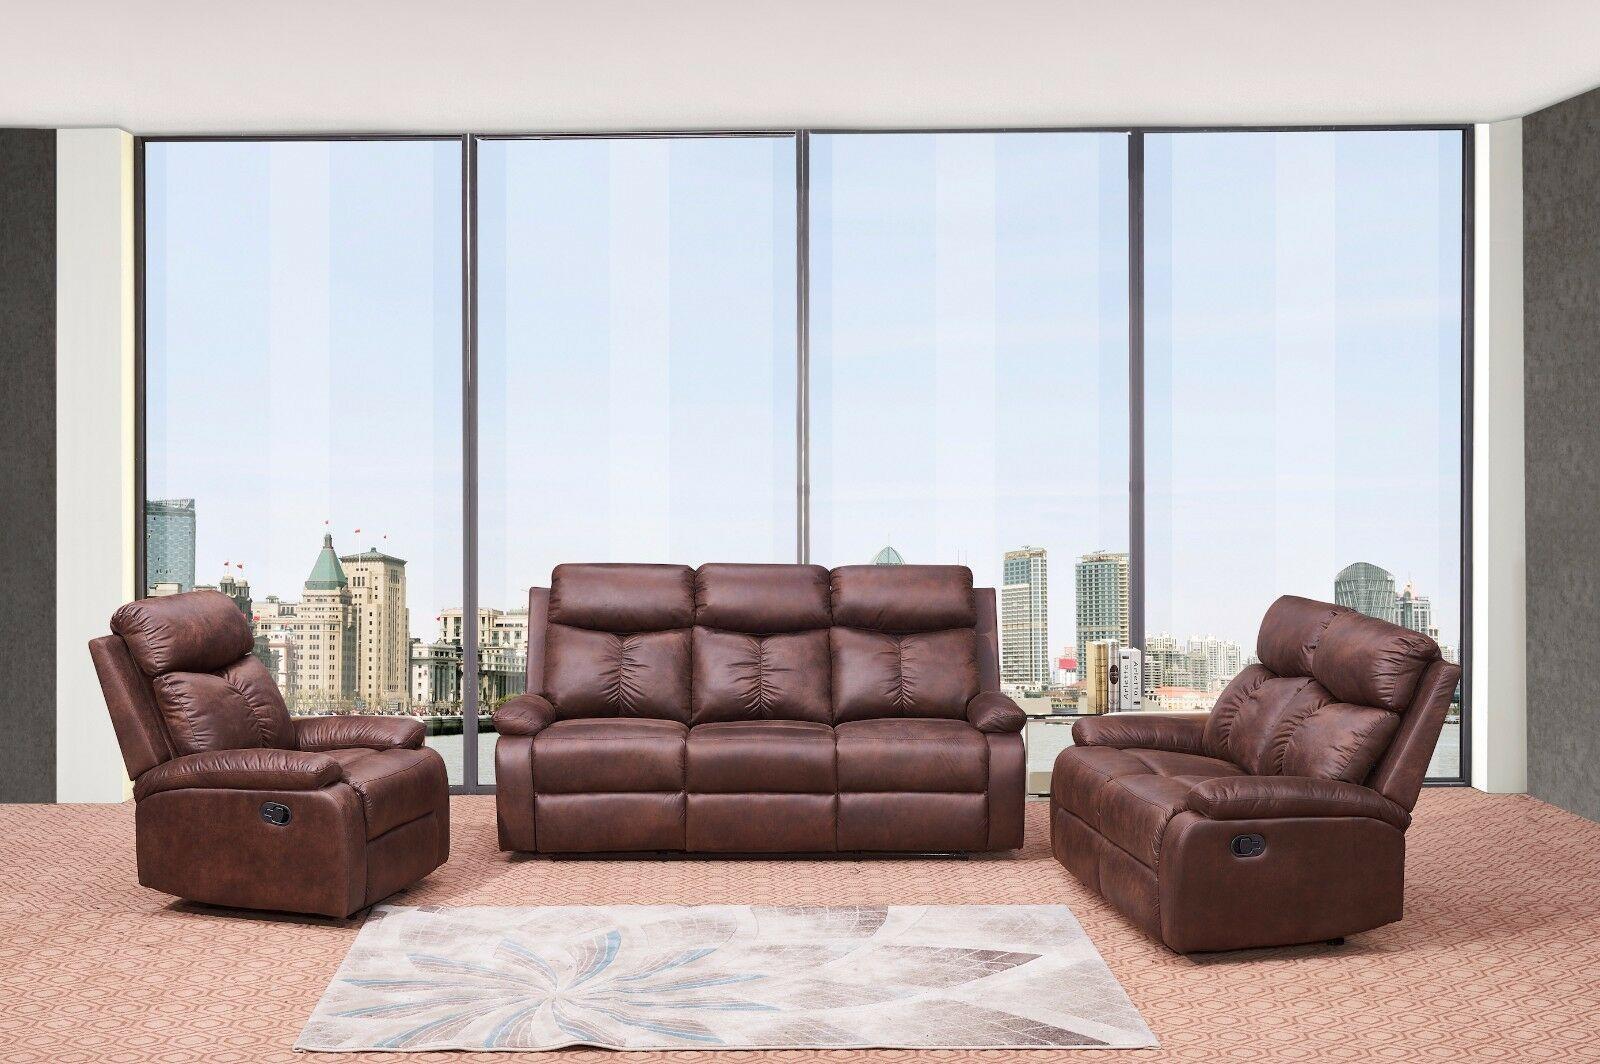 Betsy Furniture 3 Pc Recliner Sofa Set Living Room Microfiber Fabric Brown 8065 Sofa Set Ideas In 2020 3 Piece Living Room Set Living Room Sets Living Room Leather